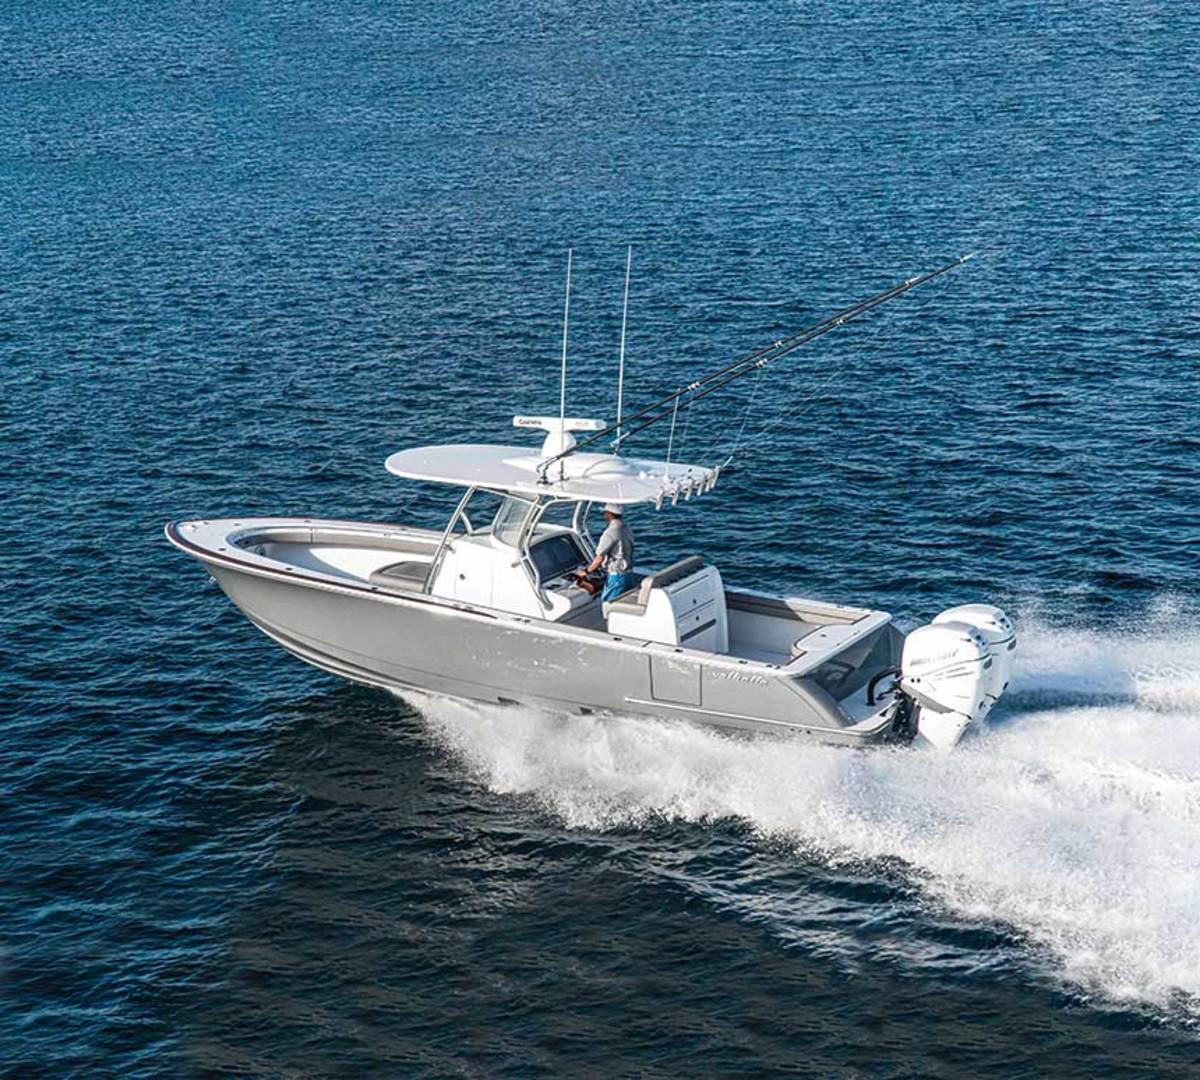 "The Valhalla V-33. LOA: 32'10"" Beam: 9'9"" Draft (engines up): 2'1"" Fuel: 327 gals. Power: (2) 400-hp Mercury Verados Price: $315,000"